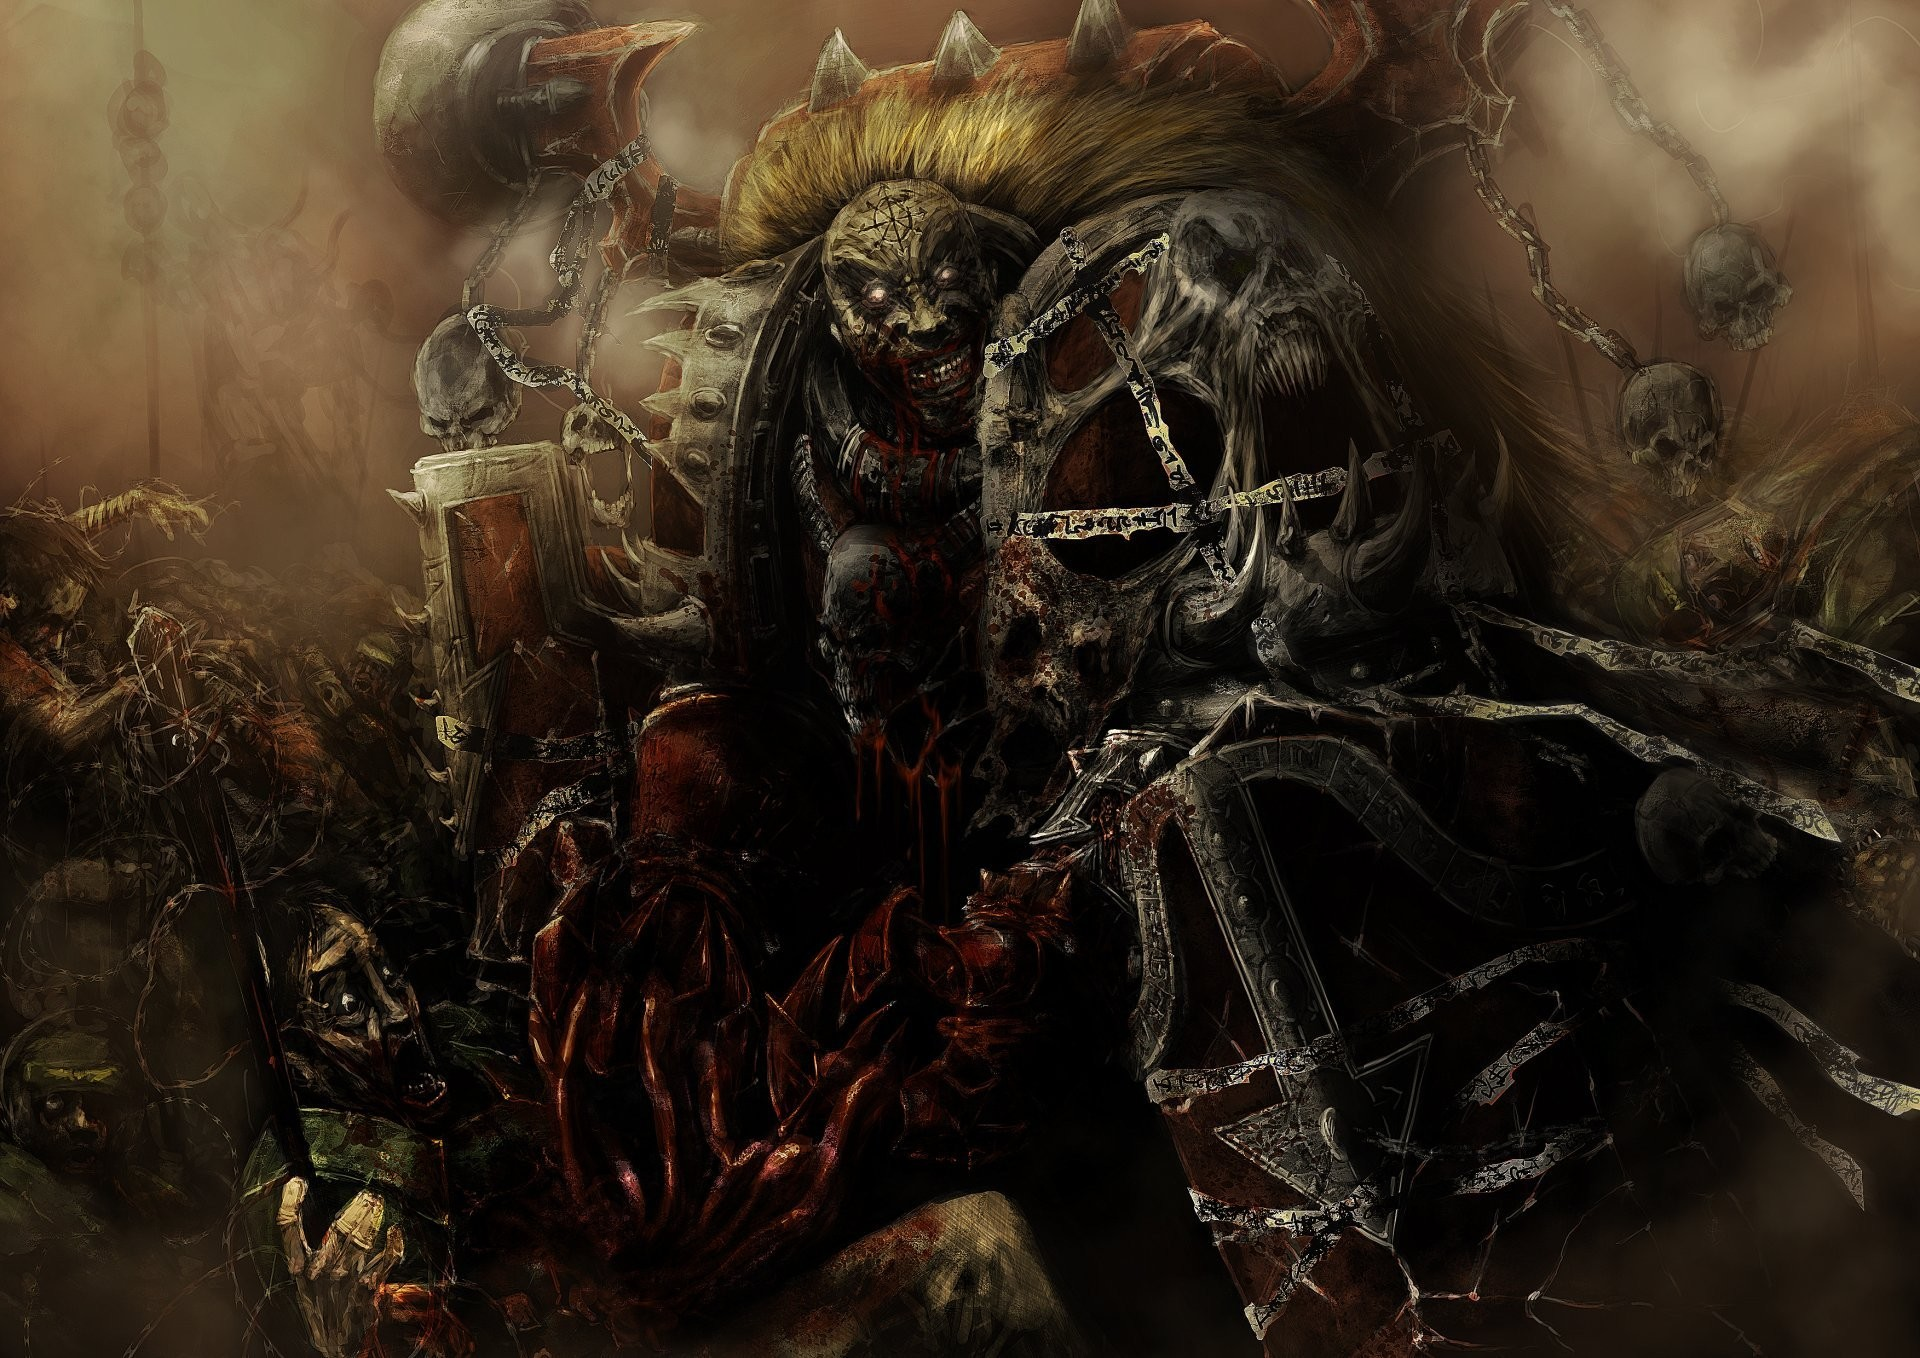 warhammer 40k chaosmarine word bearers varhamer chaos bearing the word  armour blood madness skull imperial guard